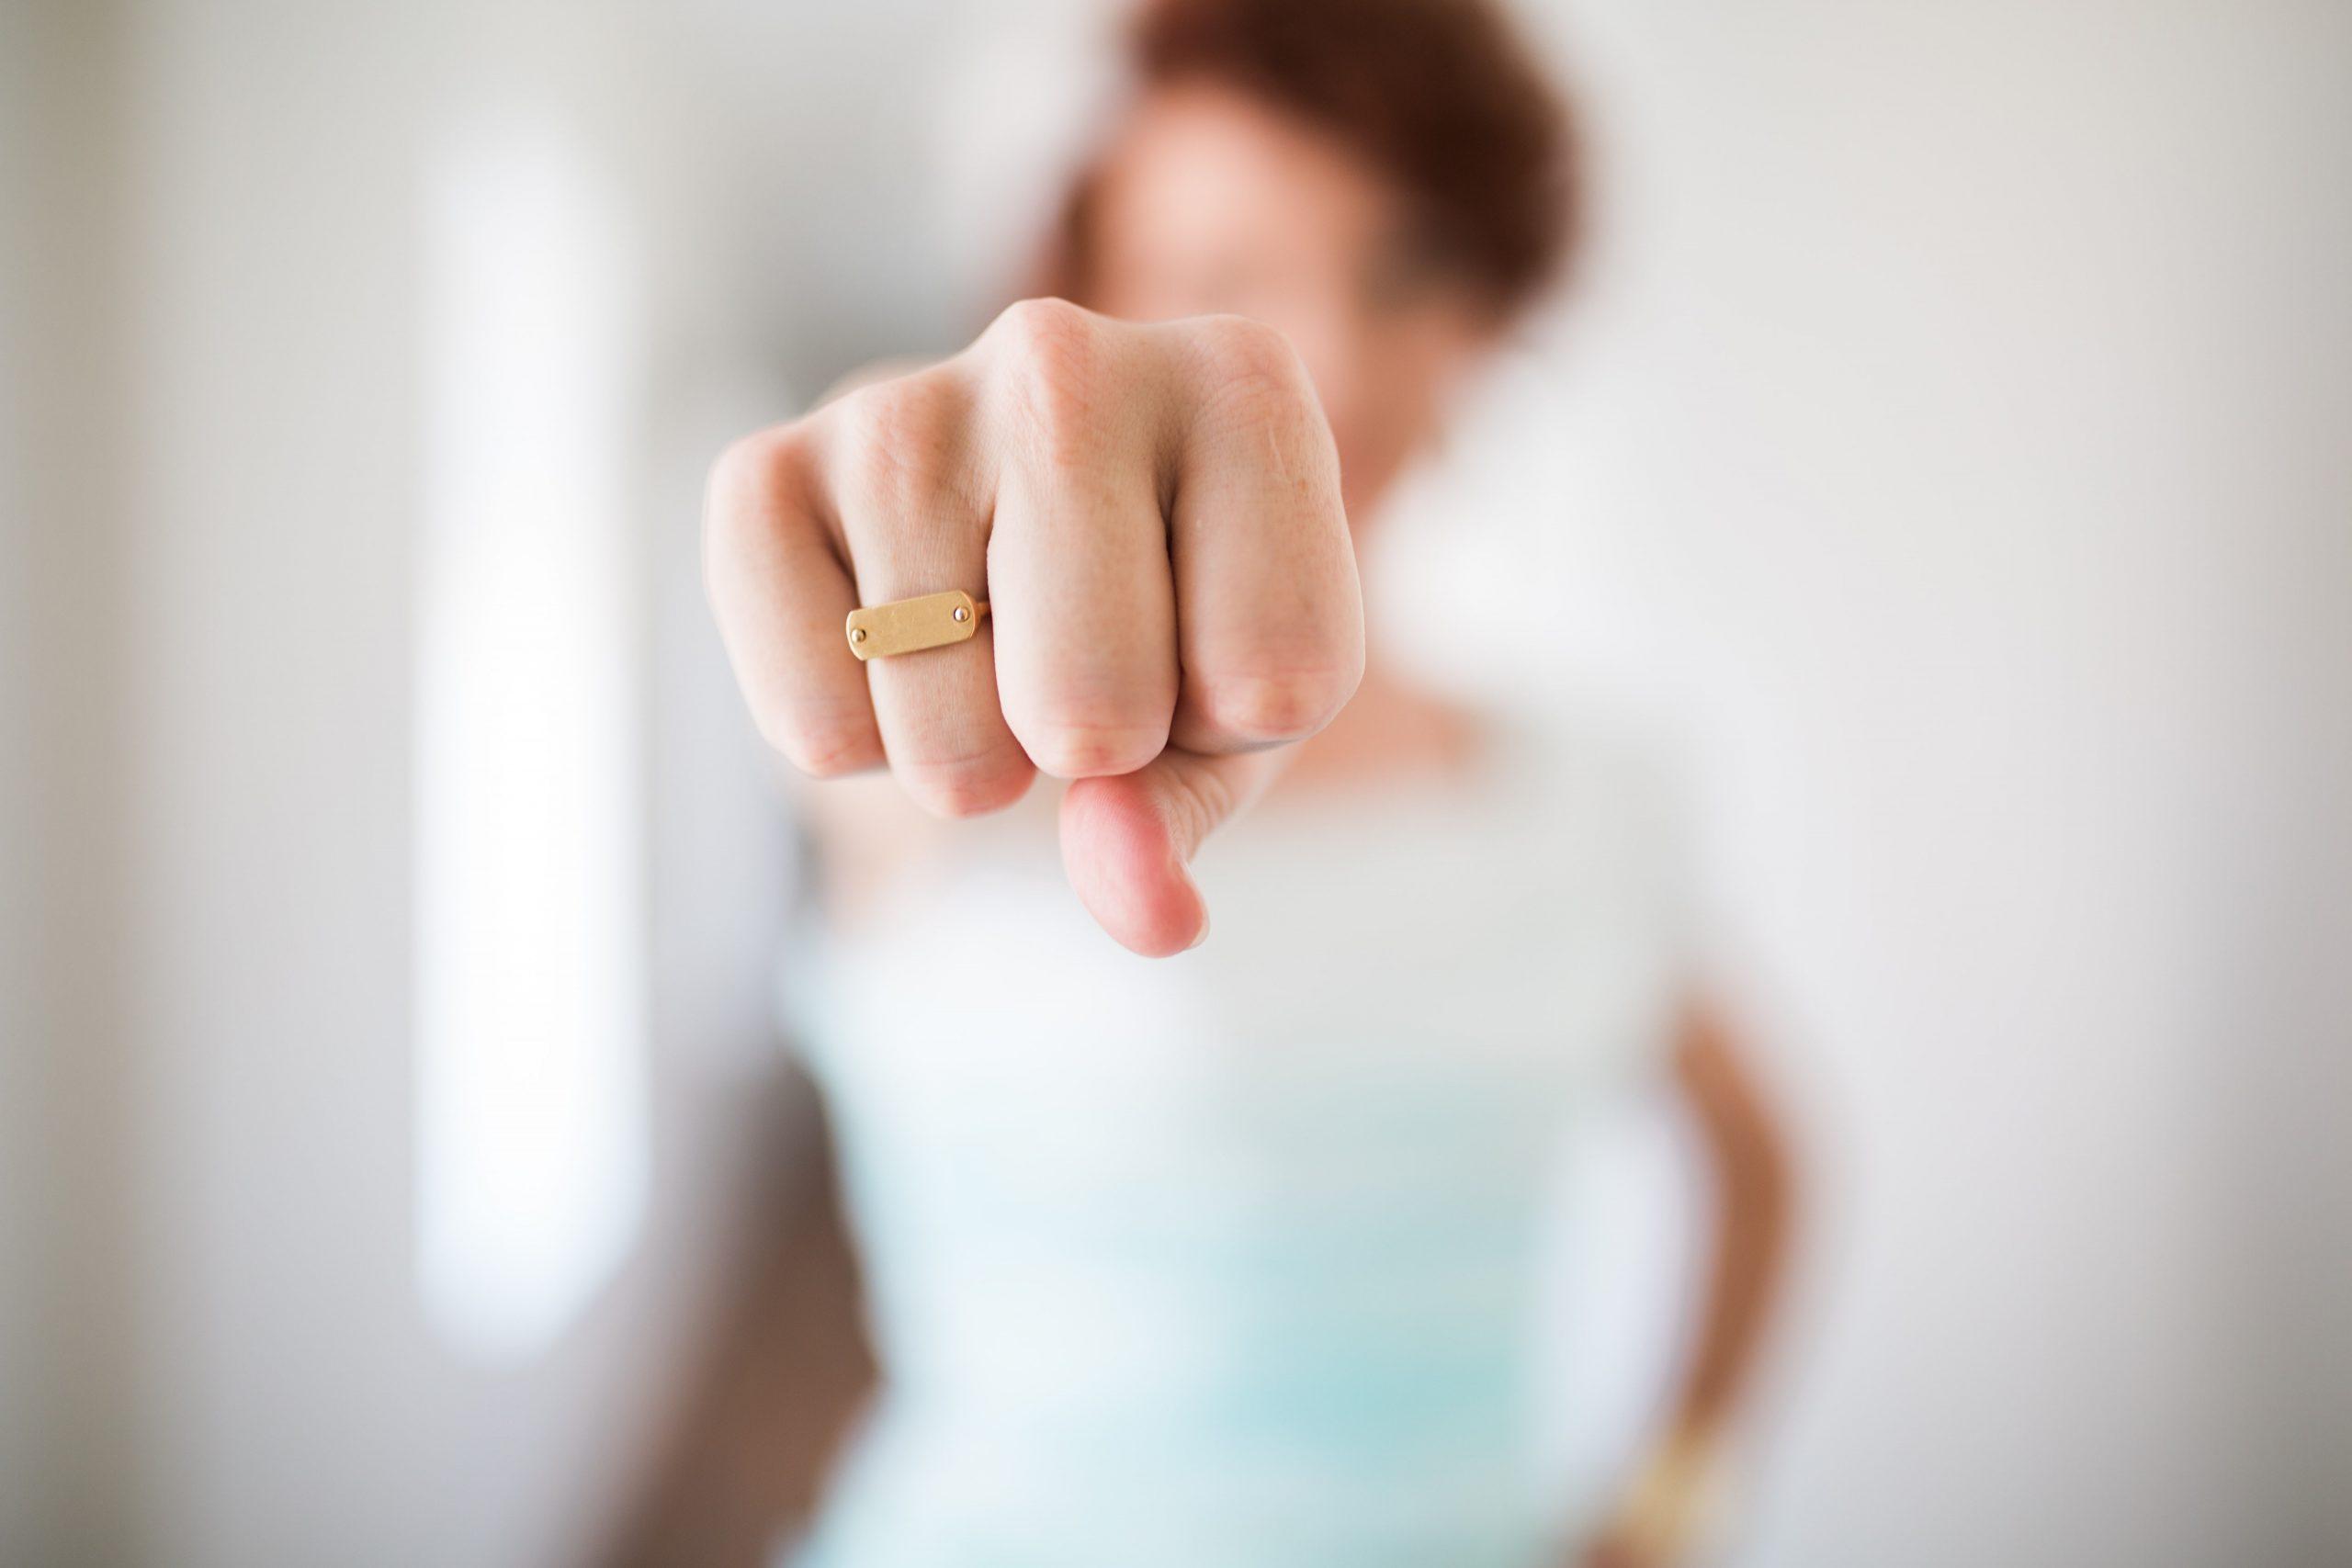 ¿EL ABUSO SEXUAL INFANTIL IMPLICA SIEMPRE UN TRAUMA A LARGO PLAZO?